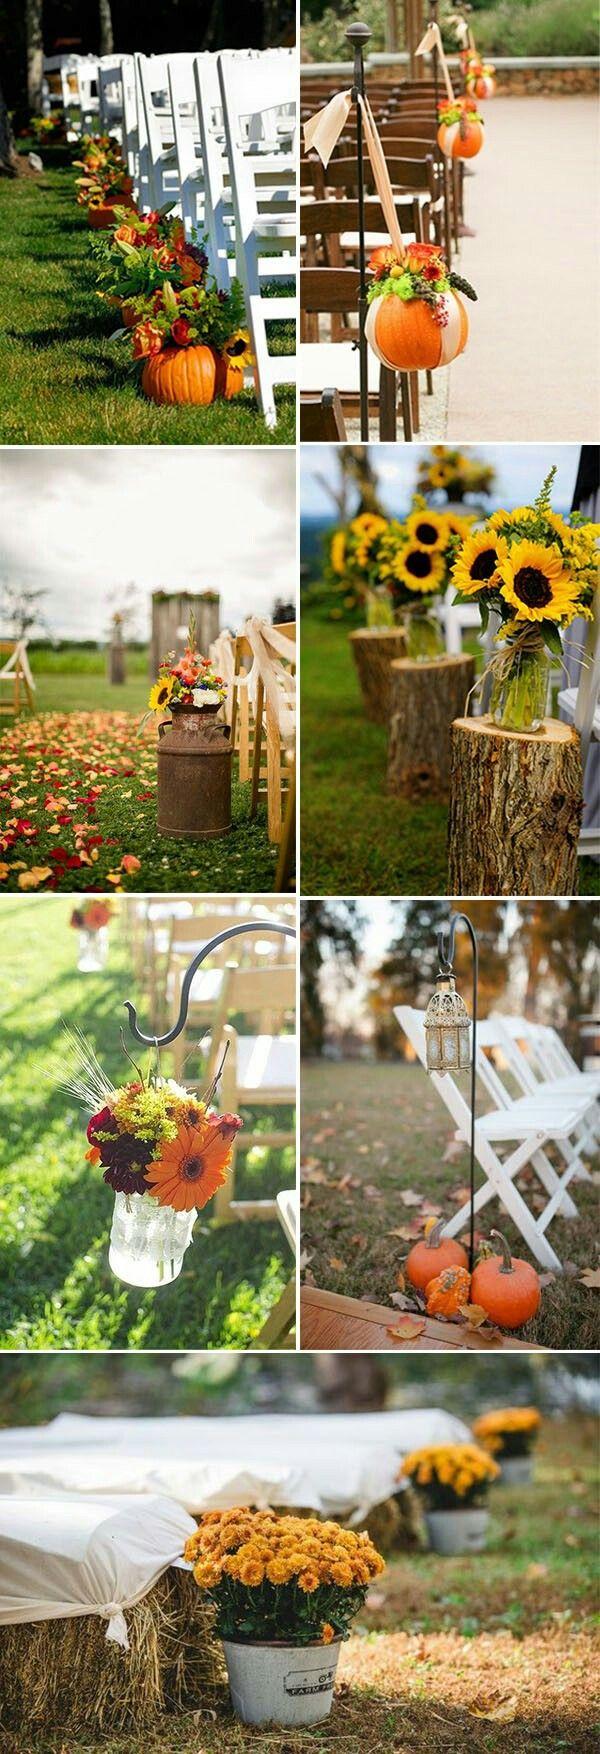 Let Celebrate at Snug Harbor host your dream wedding!